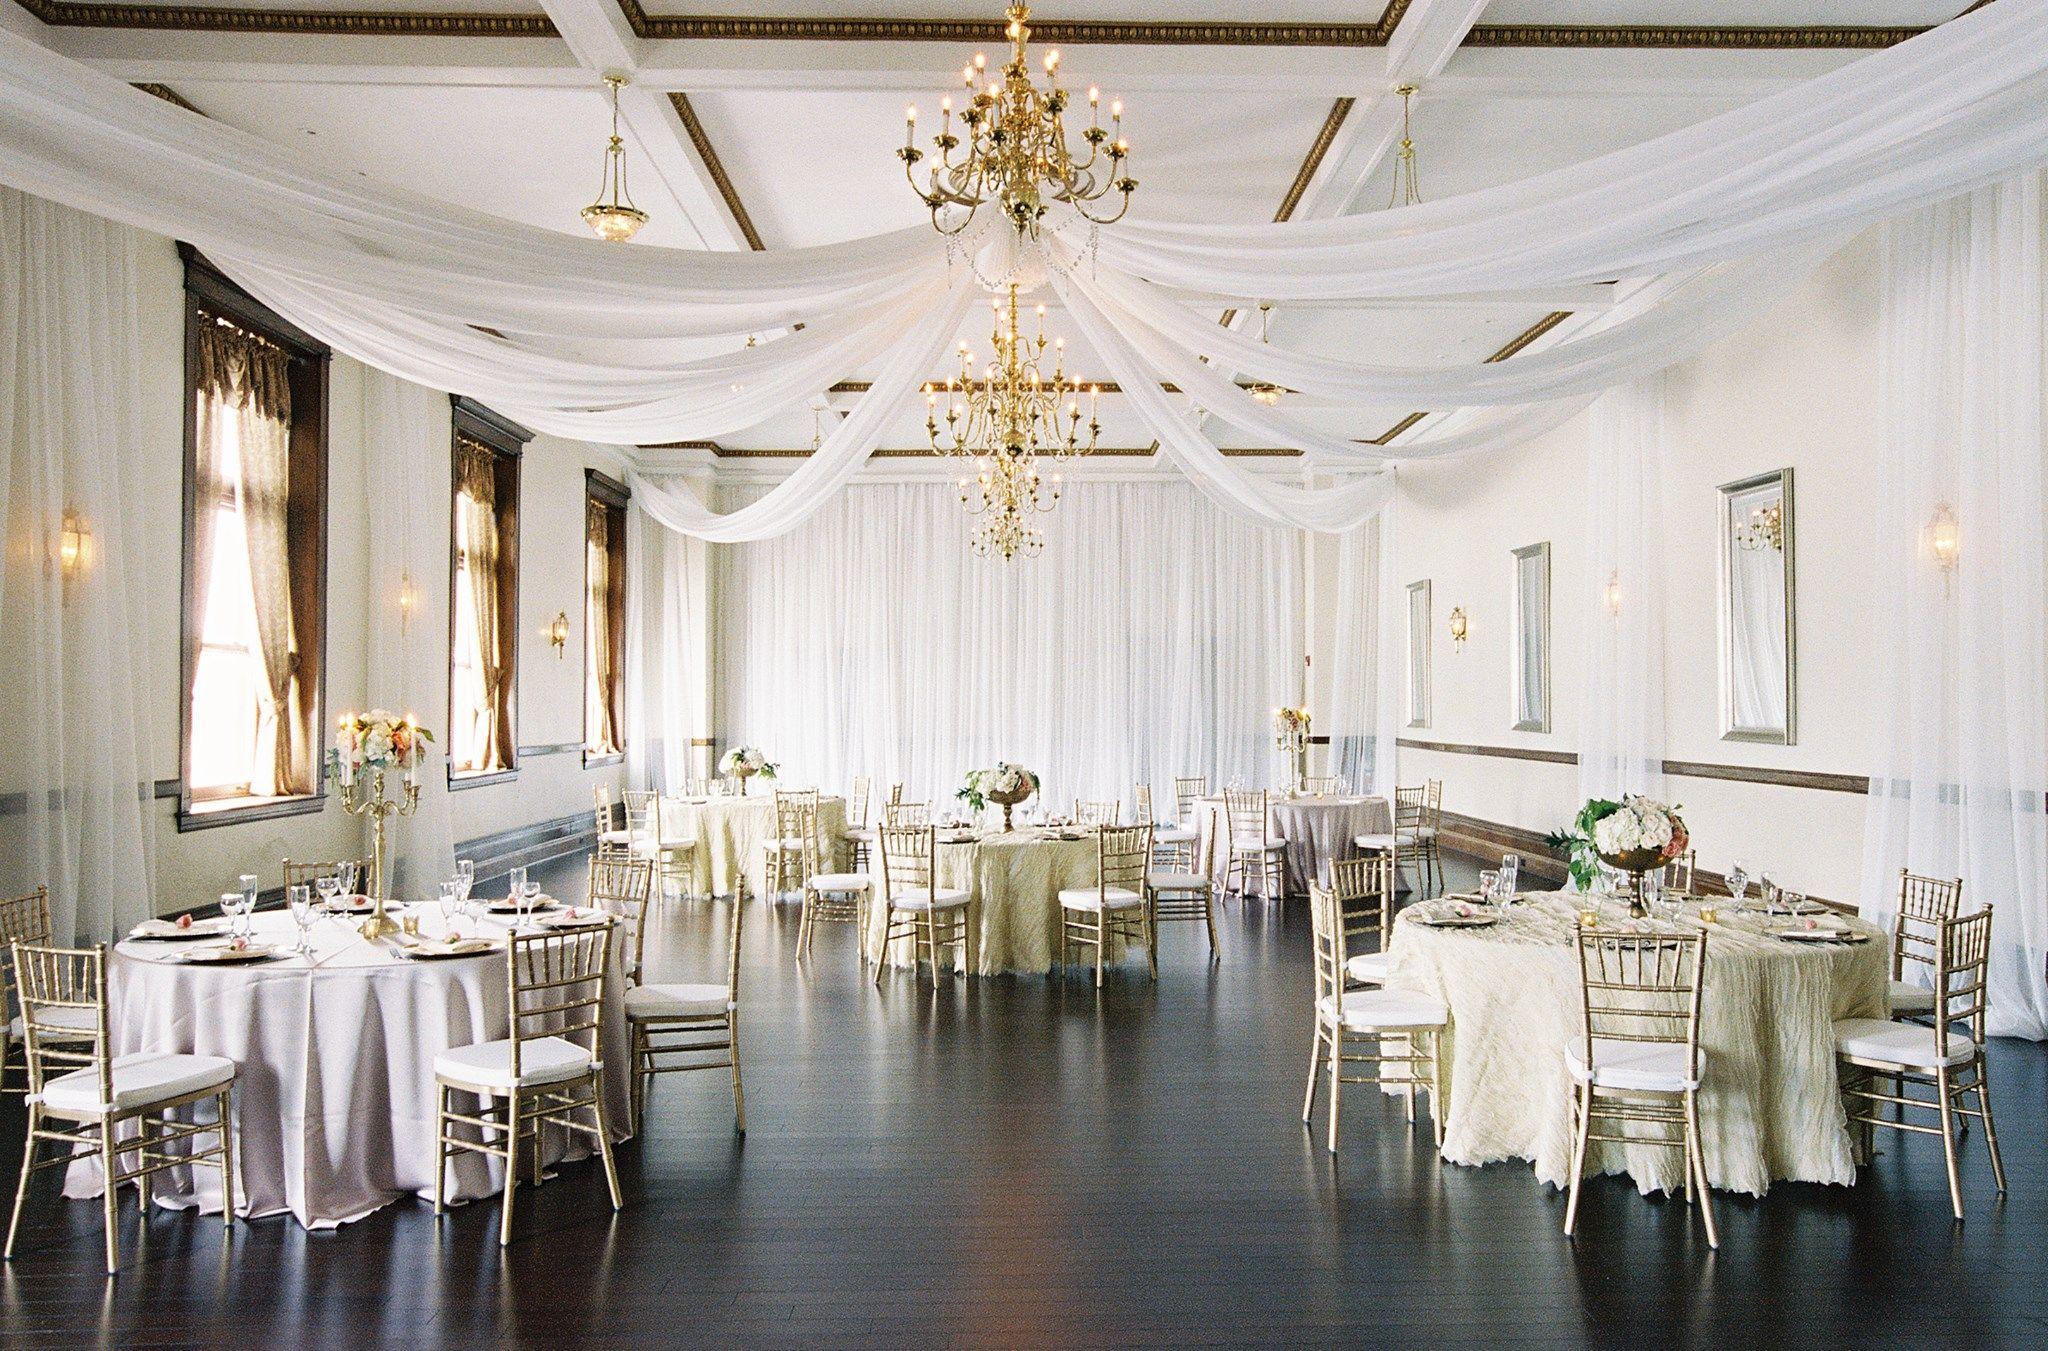 Butler' Grand Ballroom - Gorgeous Wedding And Event Venue